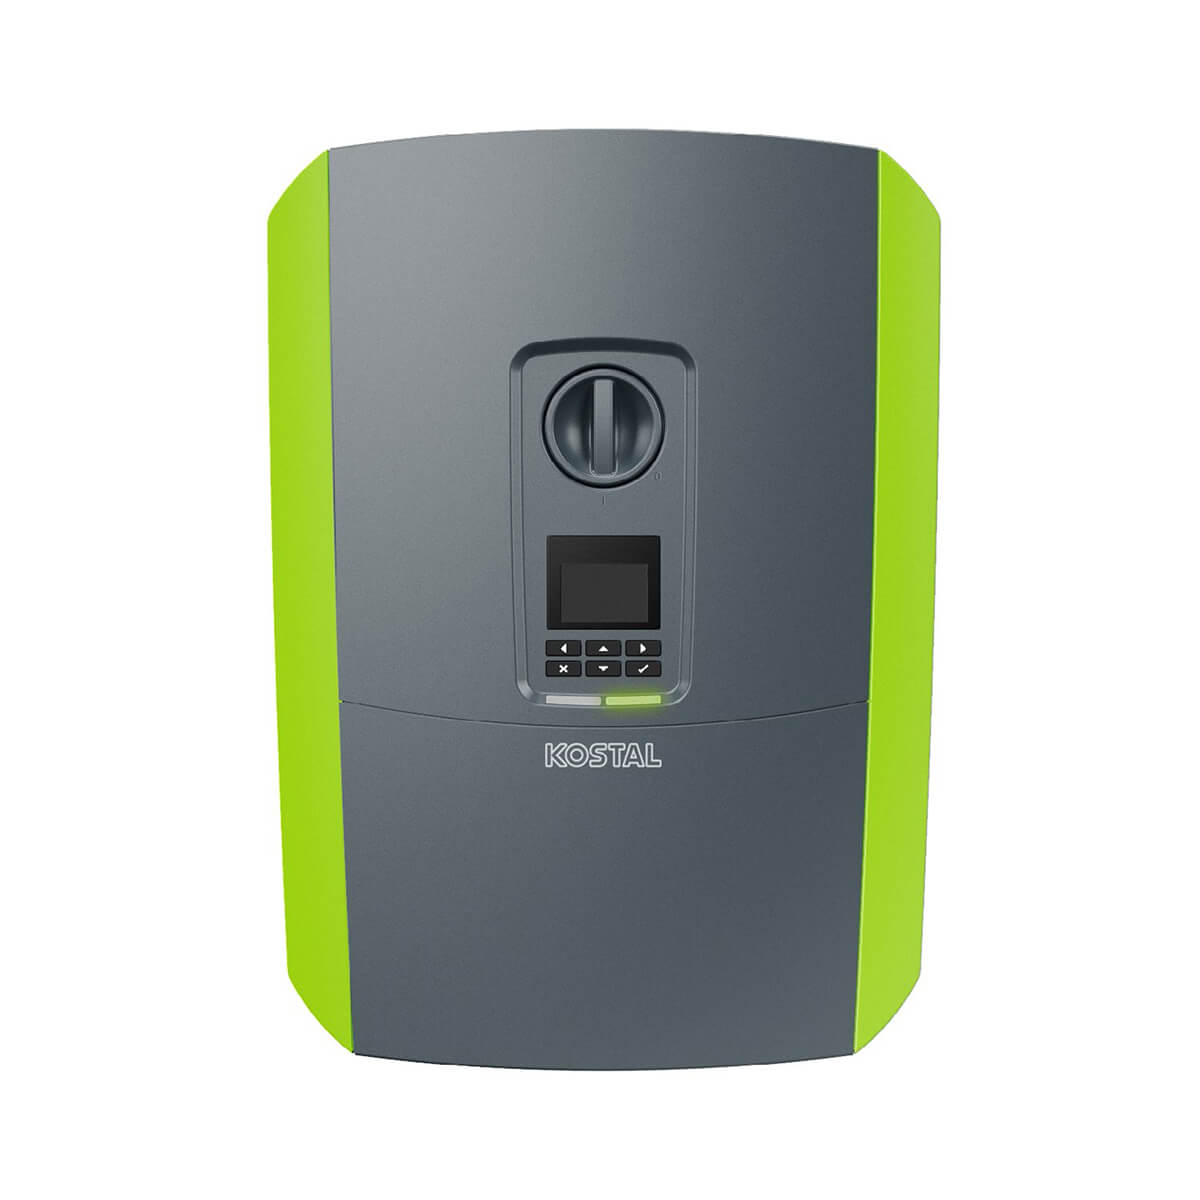 kostal 8.5kW inverter, kostal piko 8.5kW inverter, kostal piko iq 8.5 inverter, kostal piko iq 8.5, kostal piko 8.5 kW